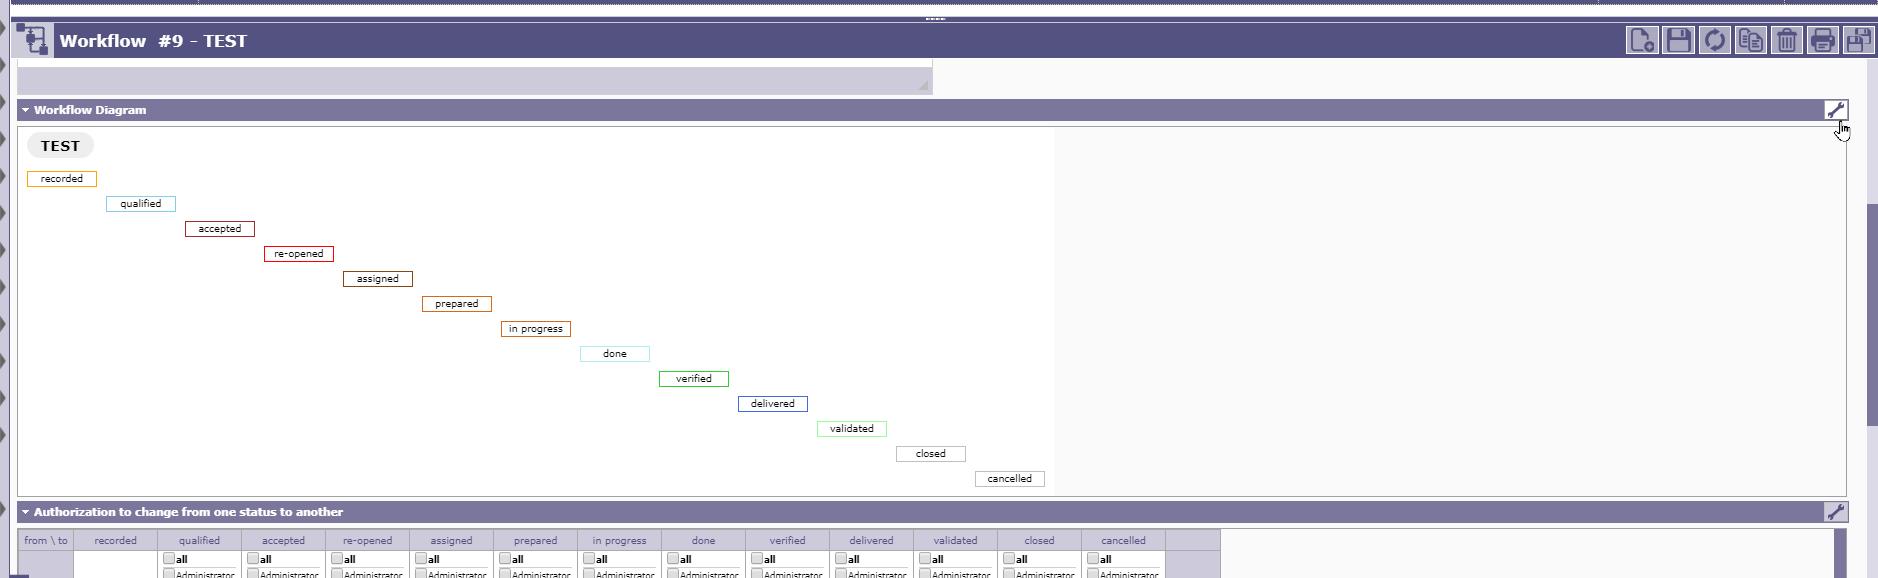 screenshot.1243.png